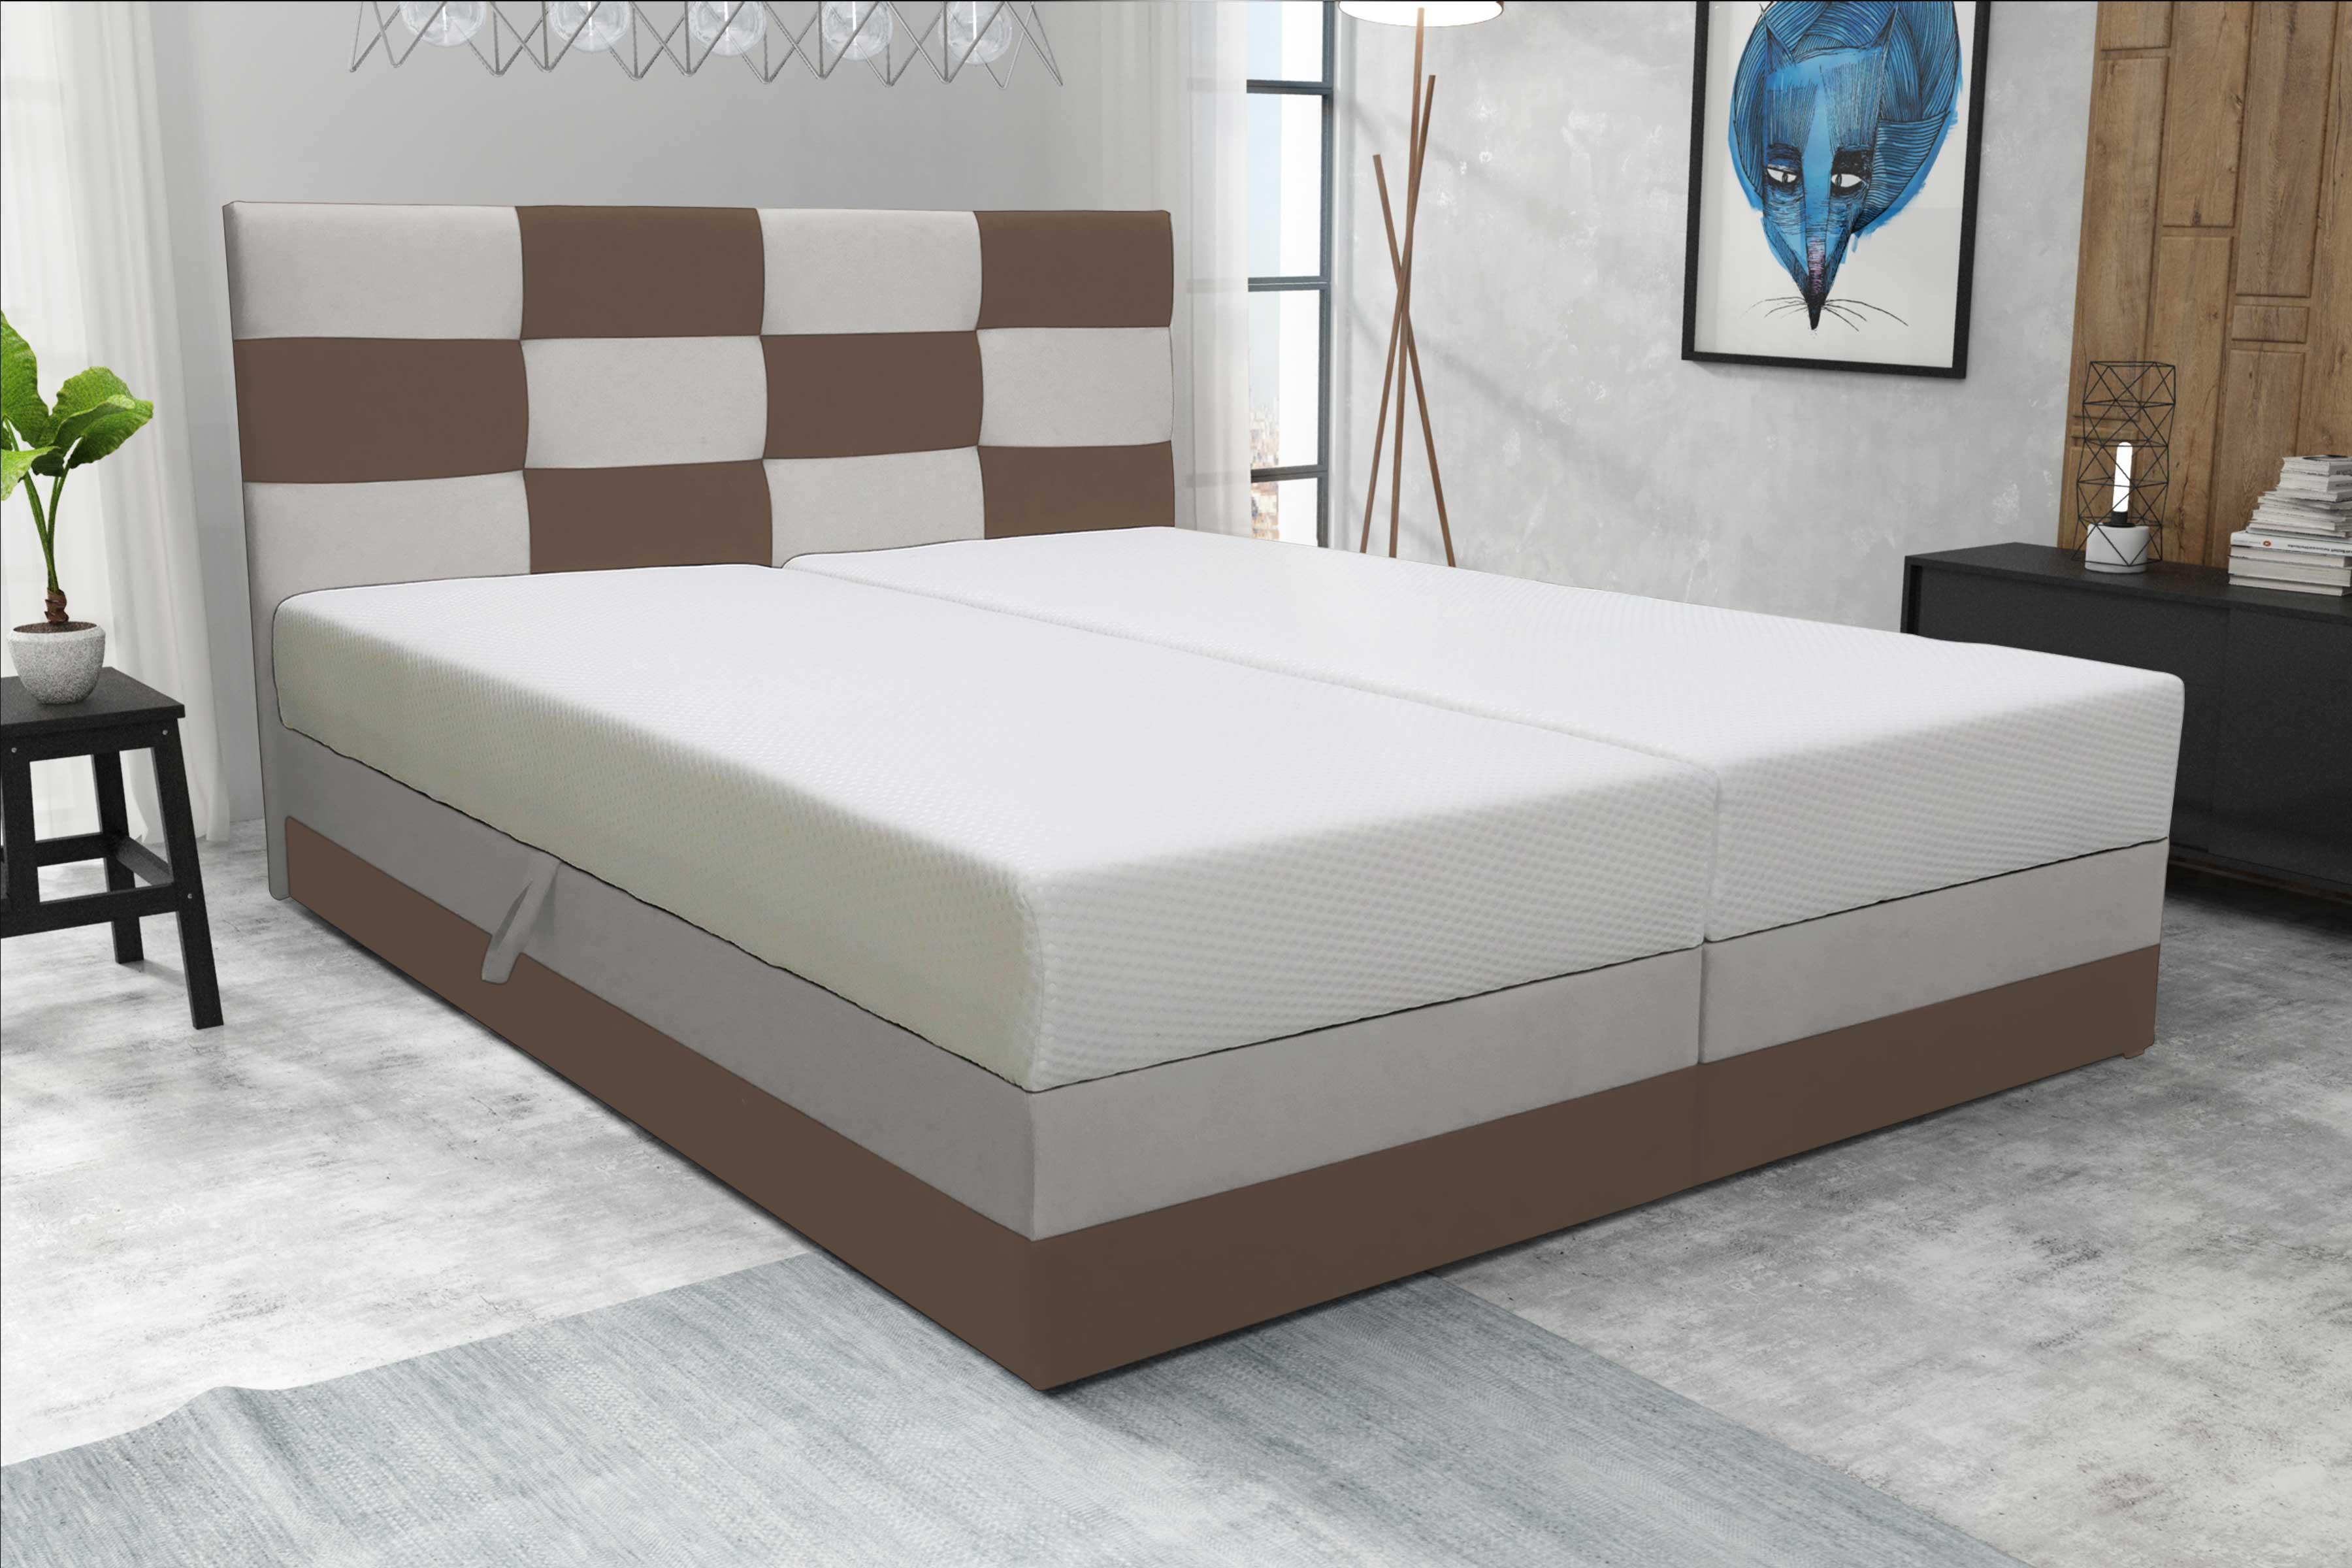 d4aa7c82983f8 Manželská posteľ 140 cm Marion (s roštom a matracom) | NovýNábytok.sk